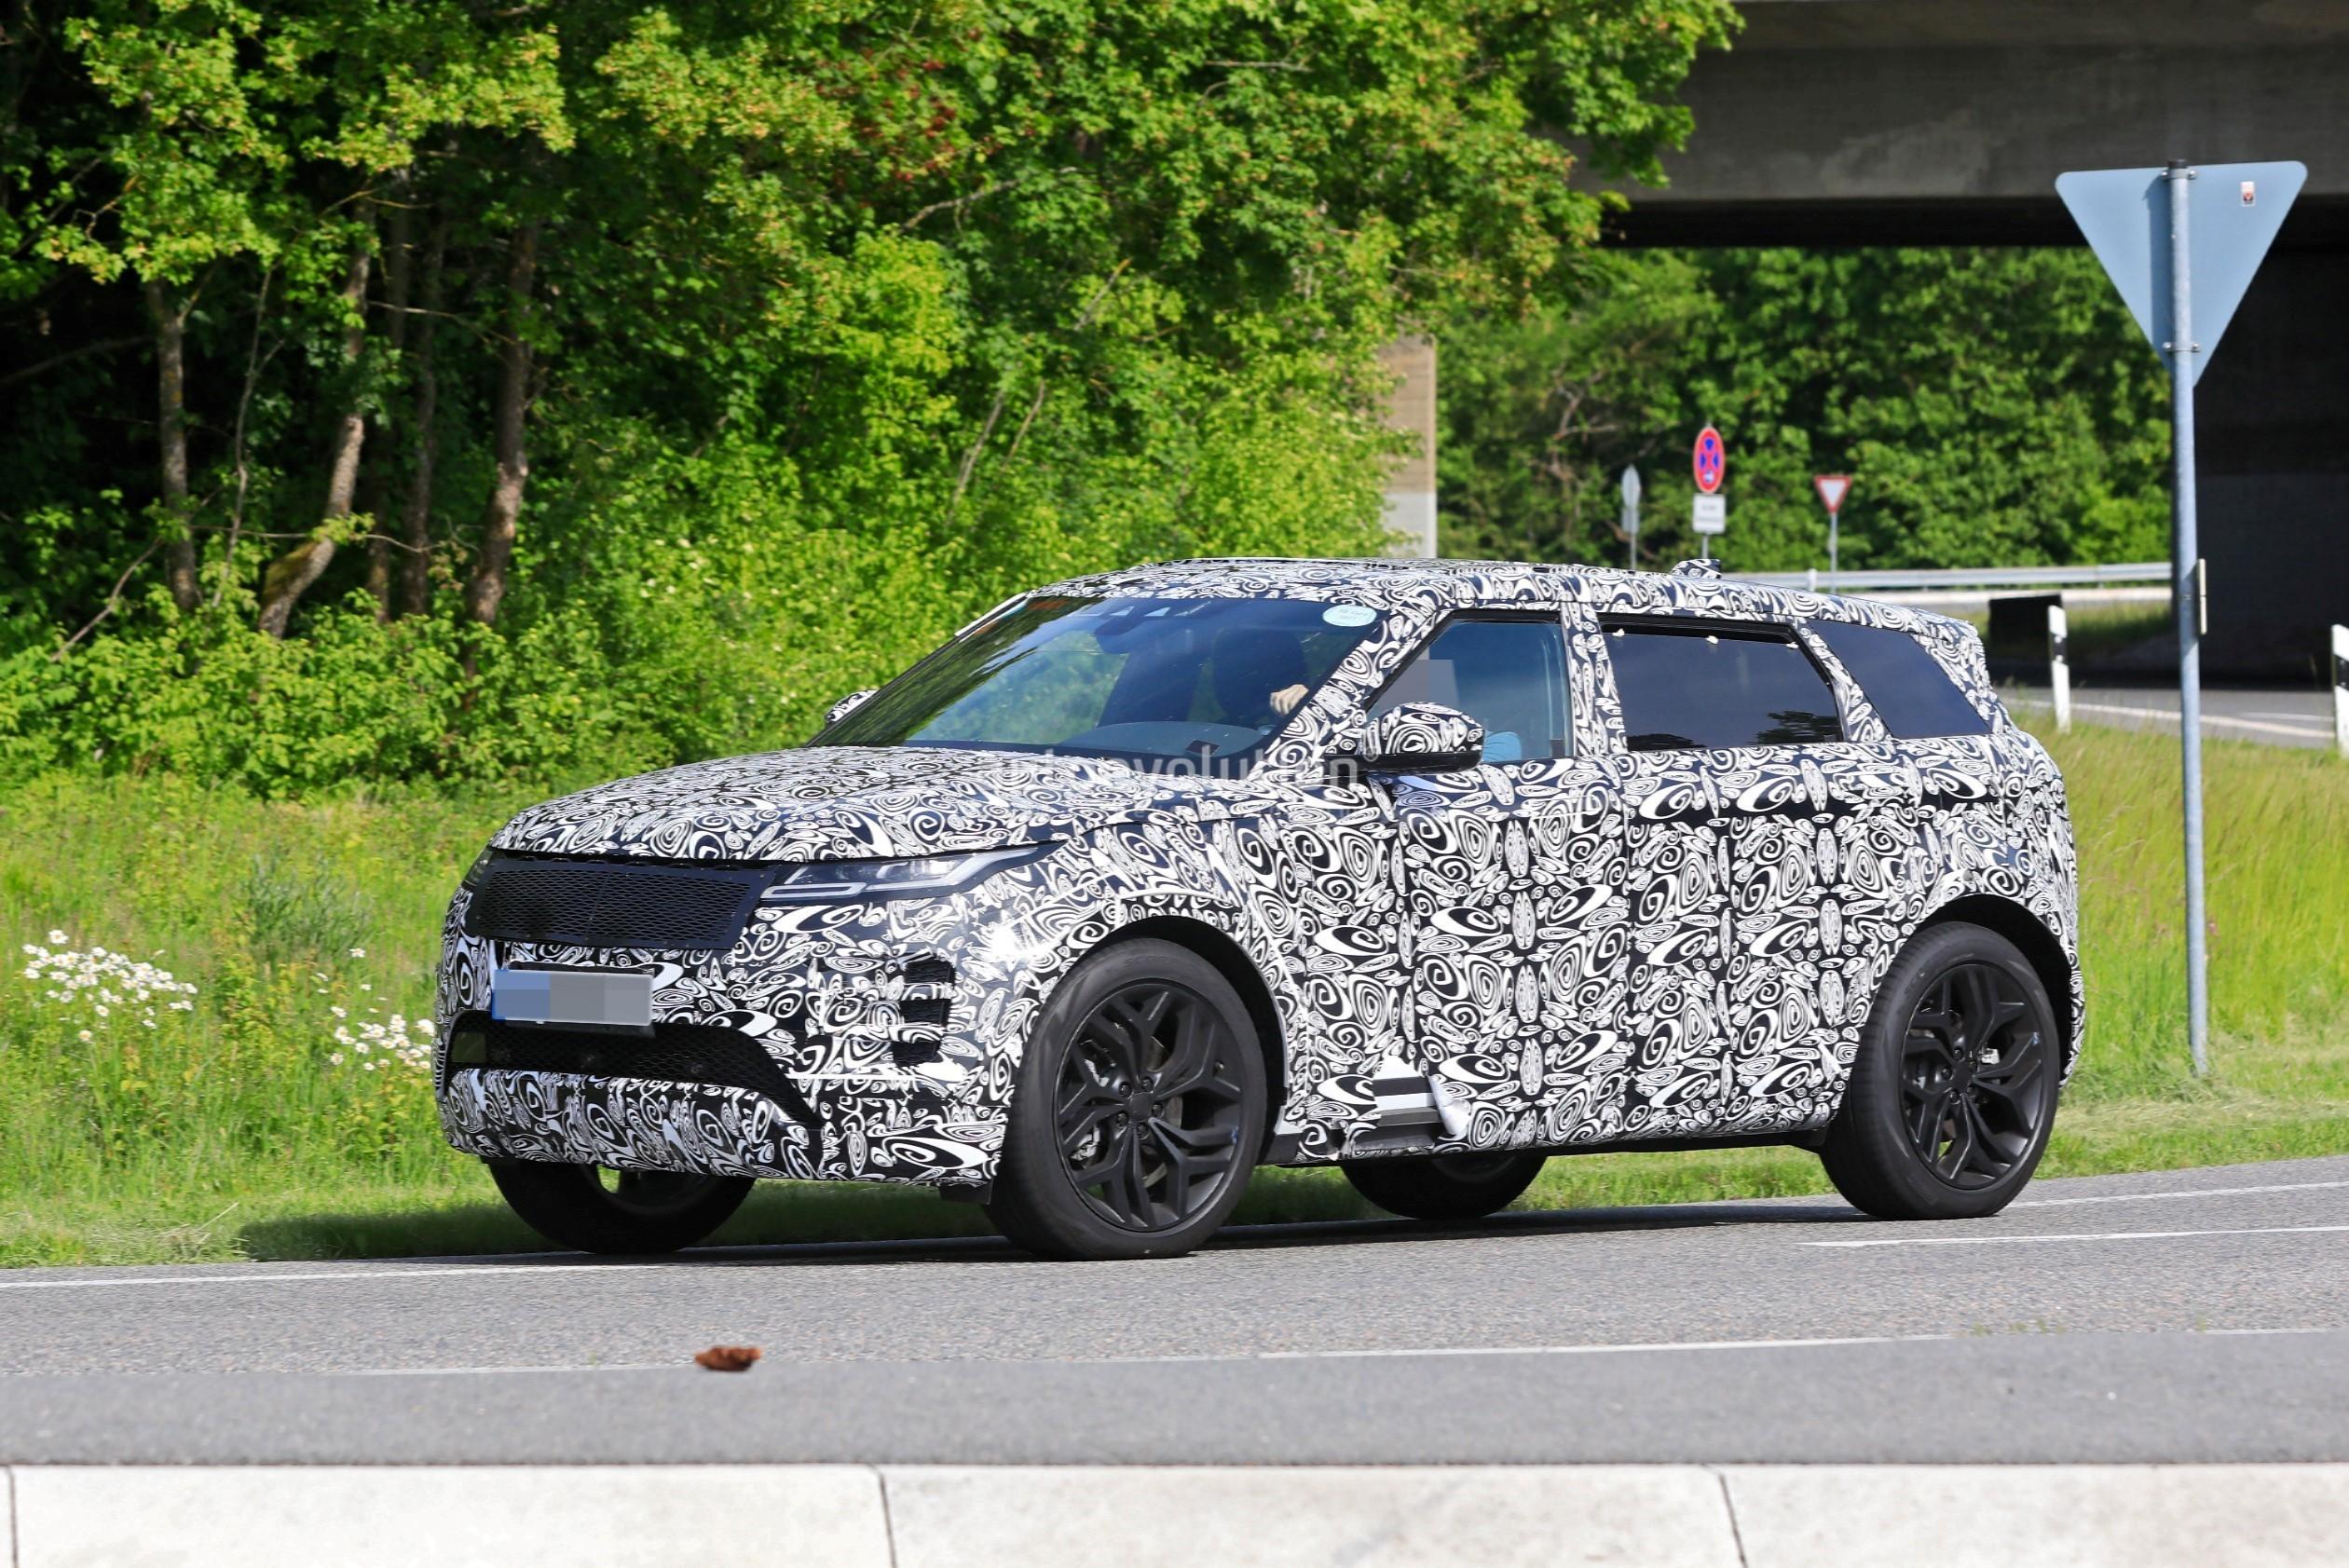 2022 Range Rover Evoque Lwb Spied With Seven Seats Familiar Exterior Design Autoevolution